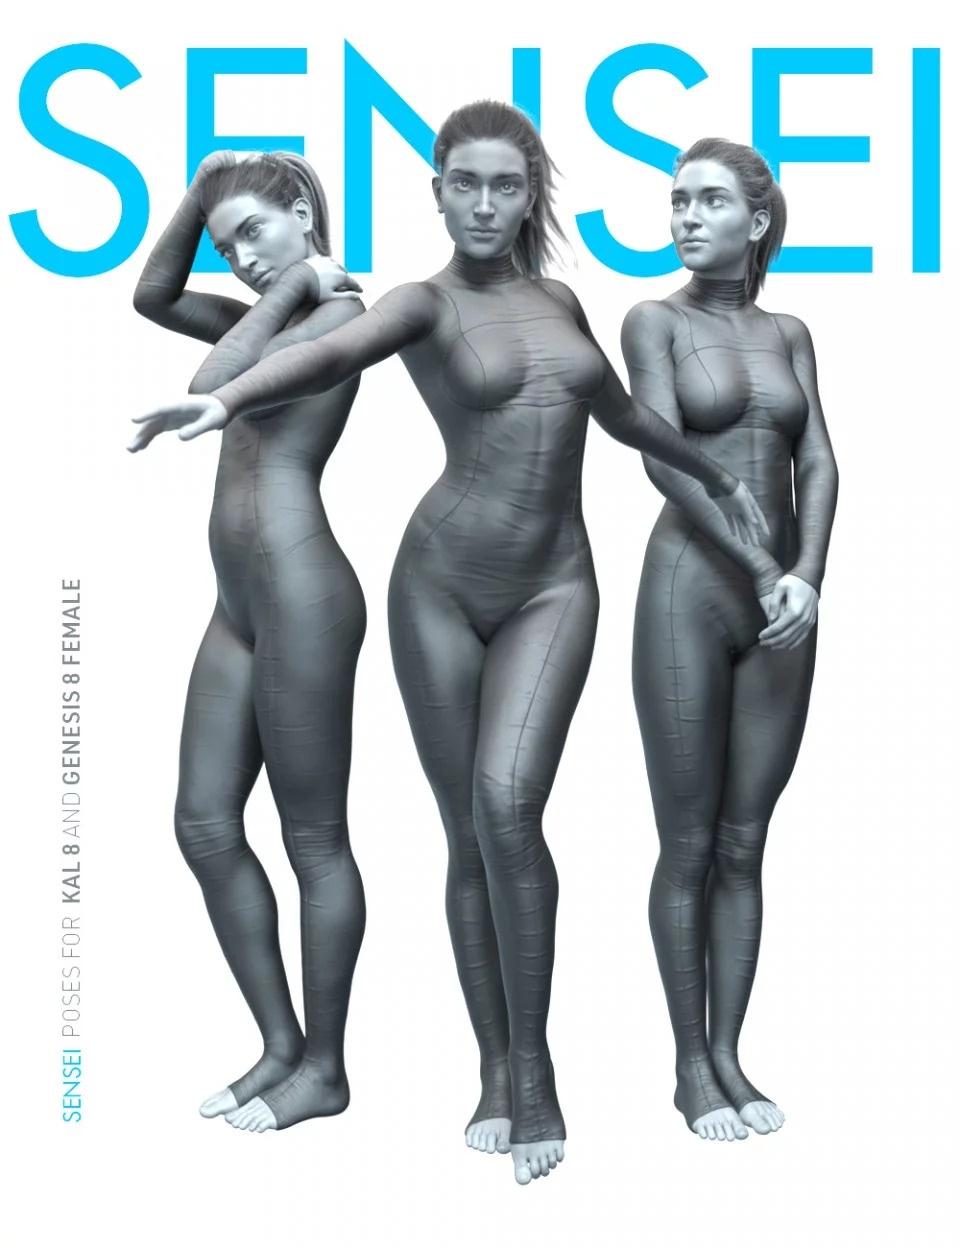 sensei-poses-for-kala-8-and-genesis-8-female